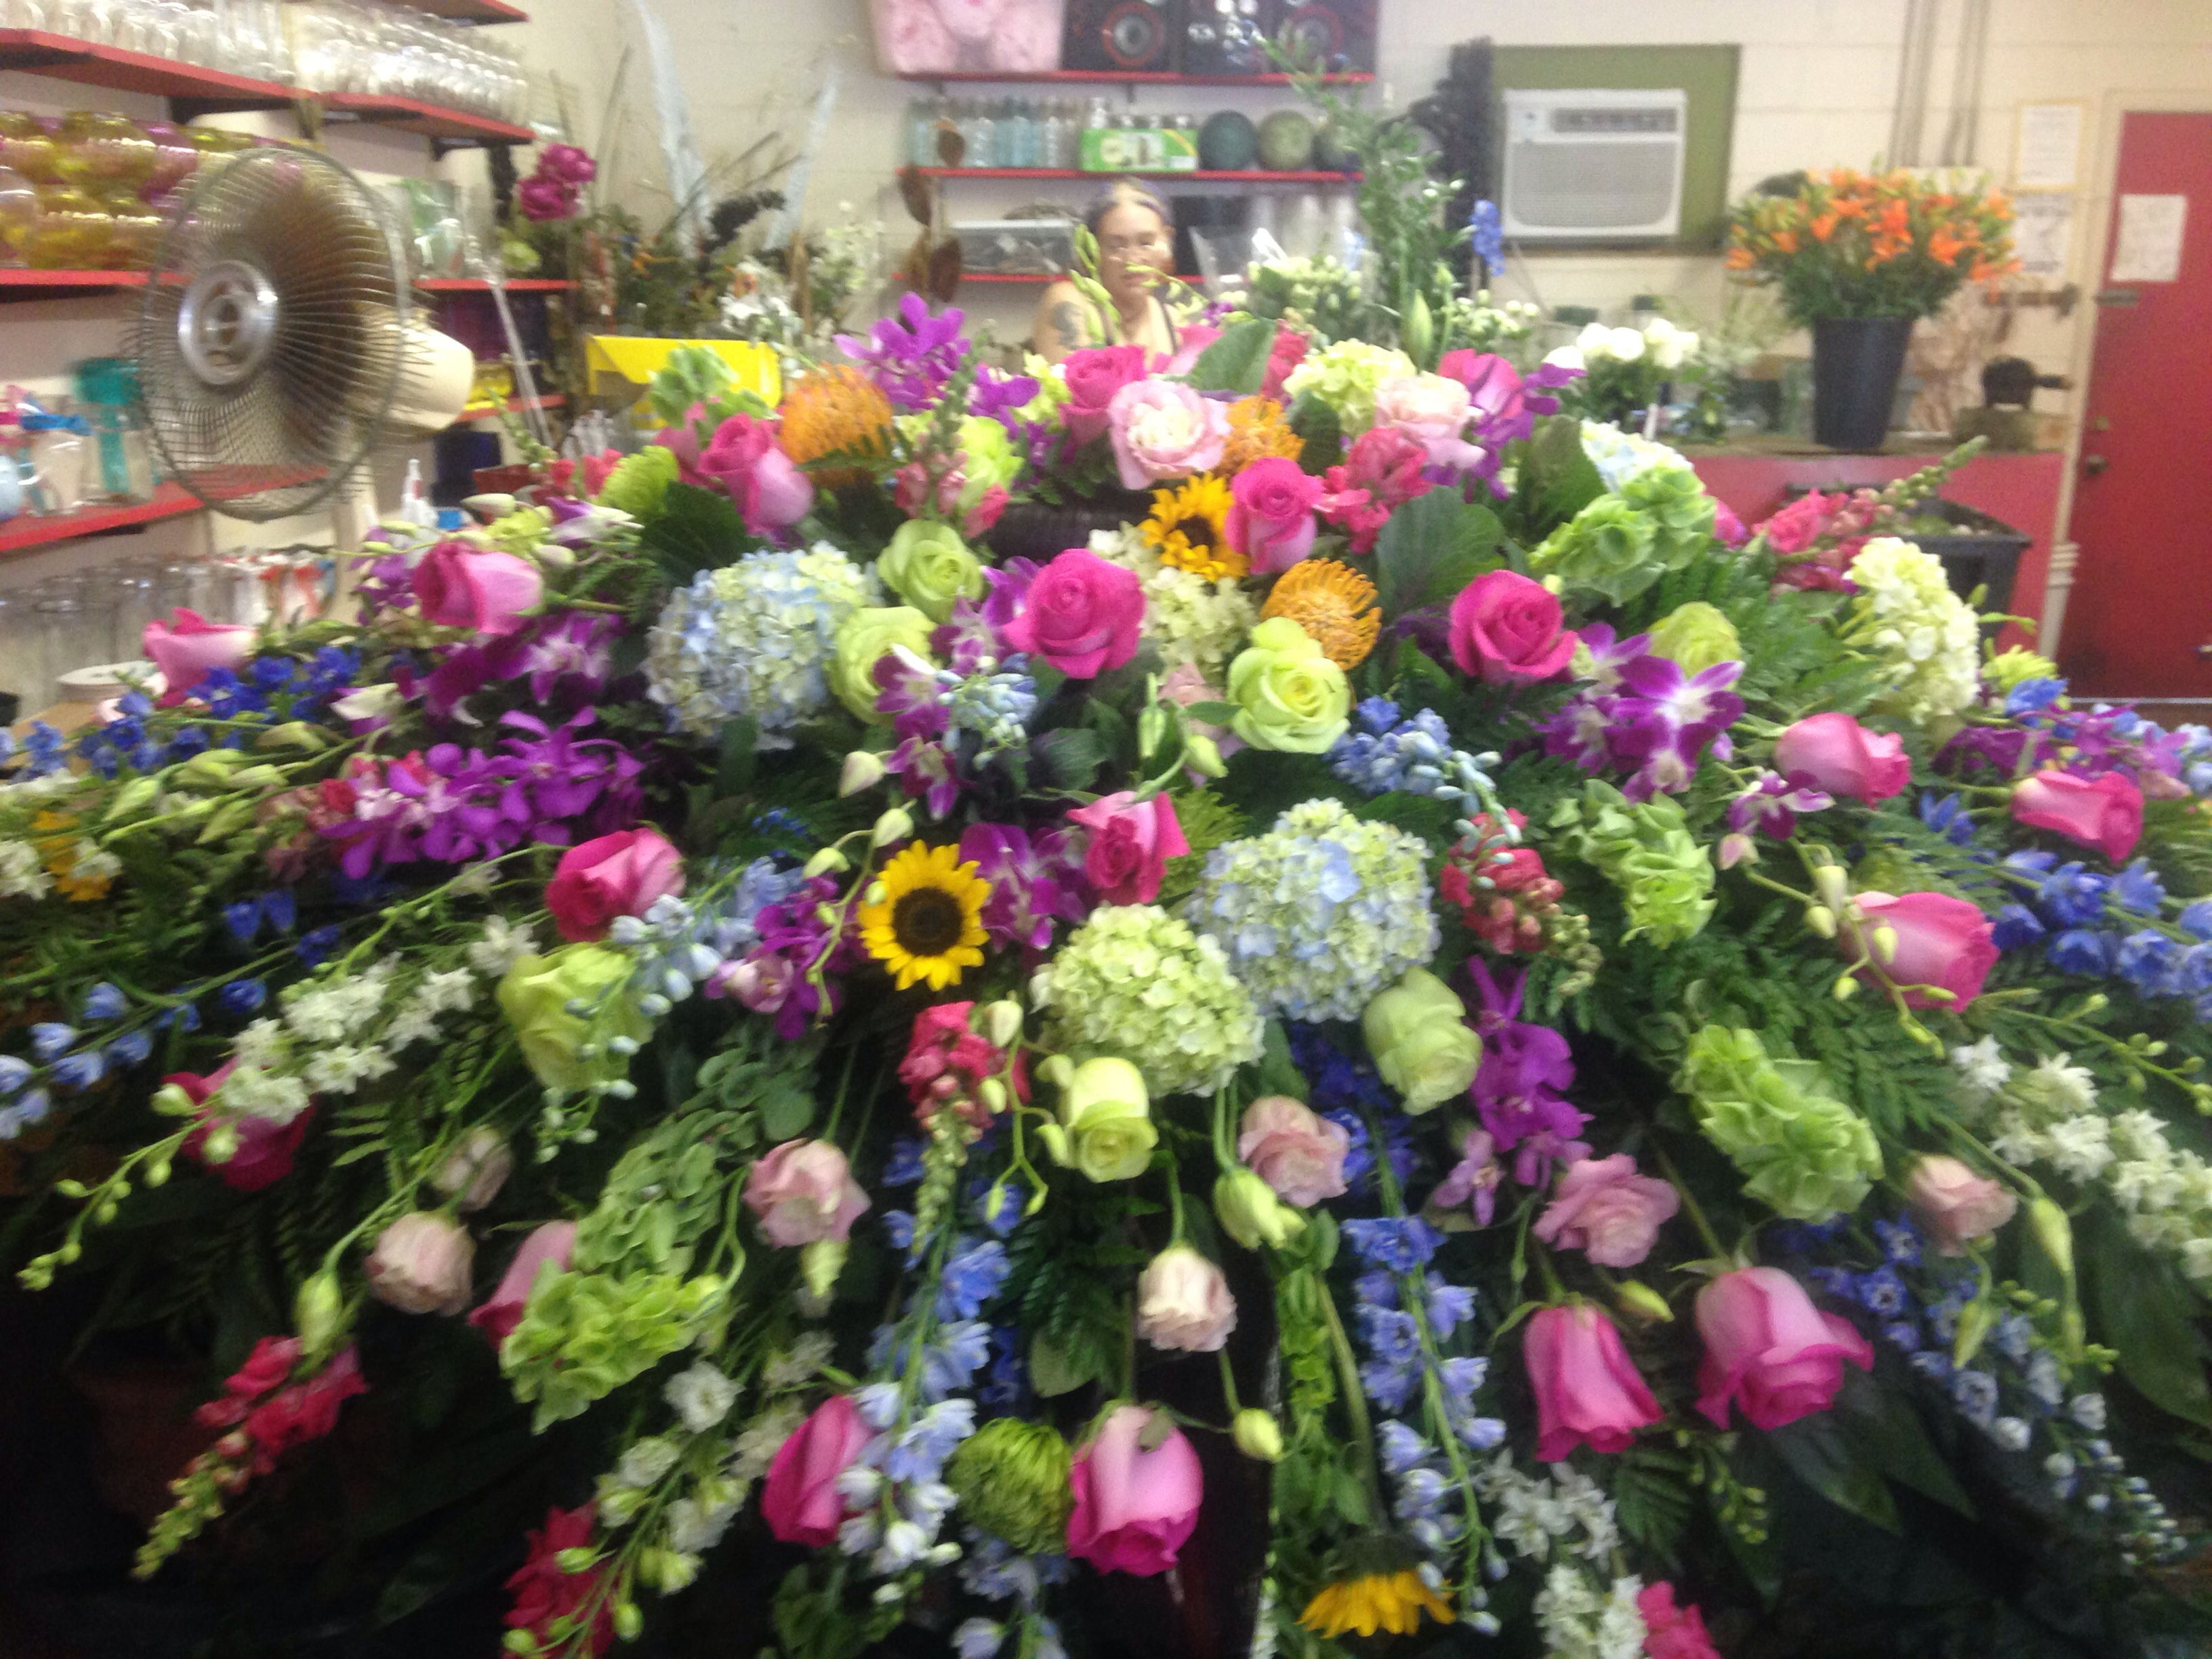 Pin By Carol Heath On Funeral Flower Arrangeents Casket Flowers Funeral Flowers Funeral Flower Arrangements